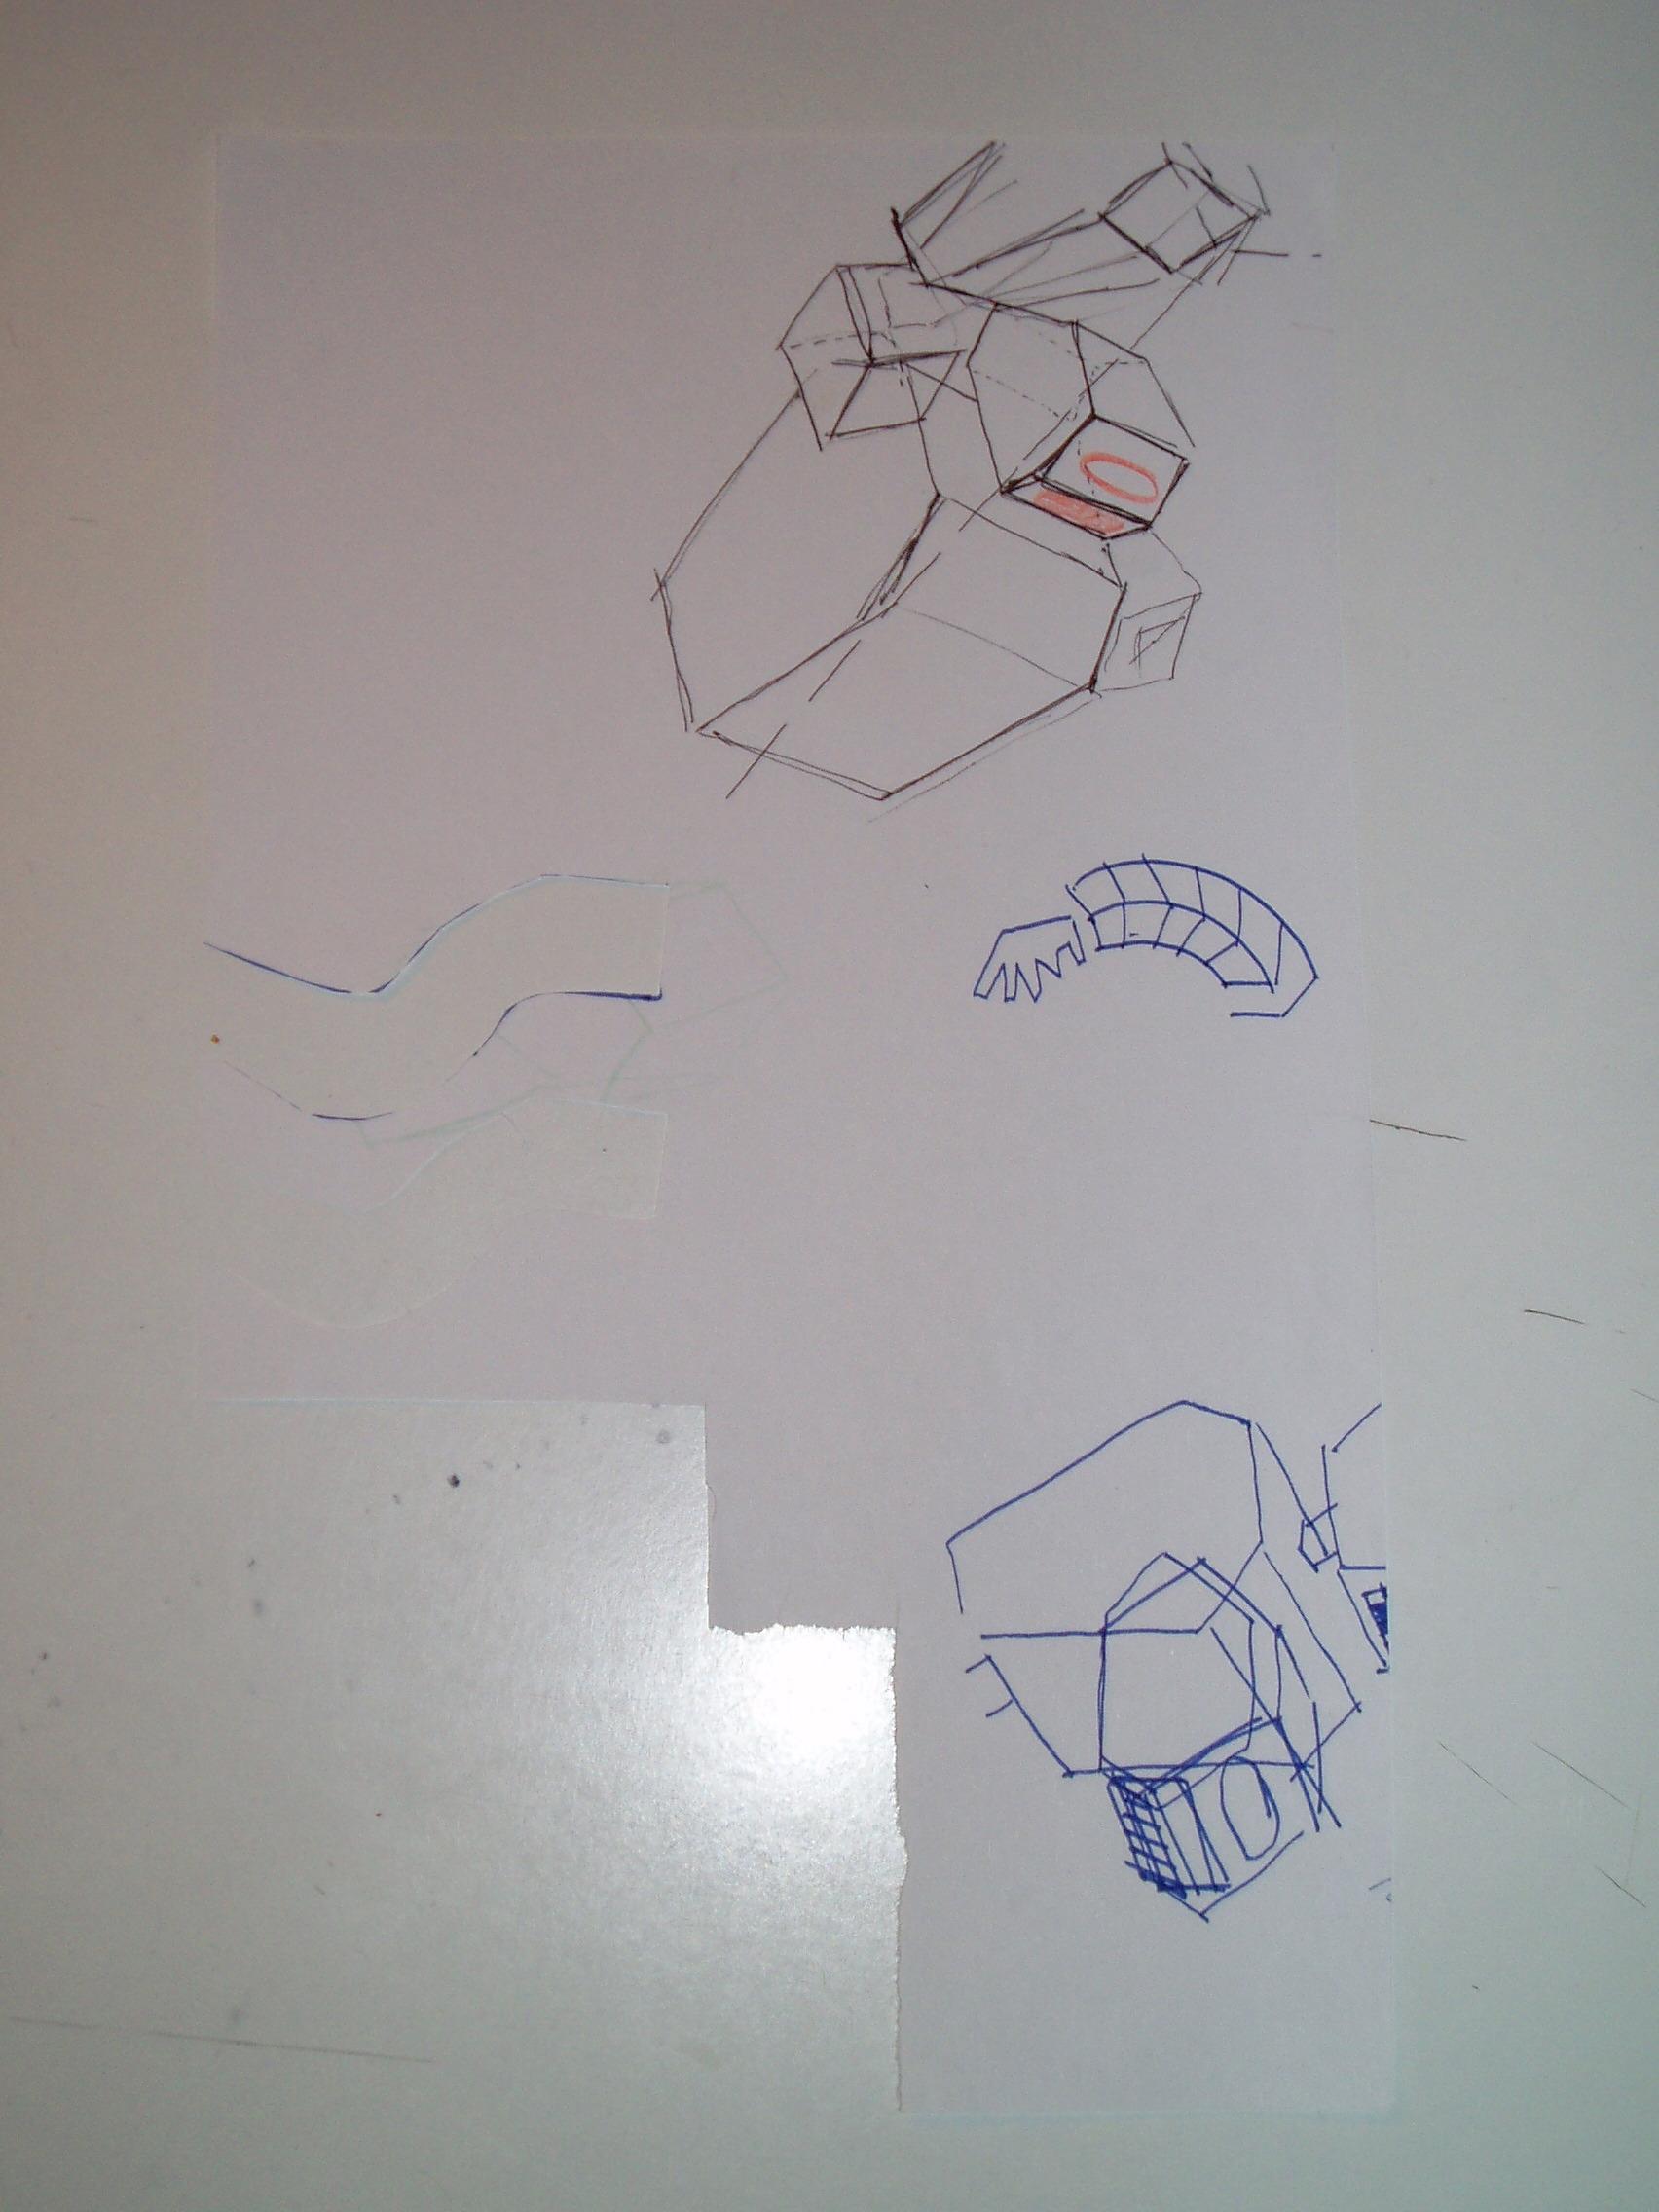 robot tecnology carta cartone disegni scritte carta pesta bomboletta spray